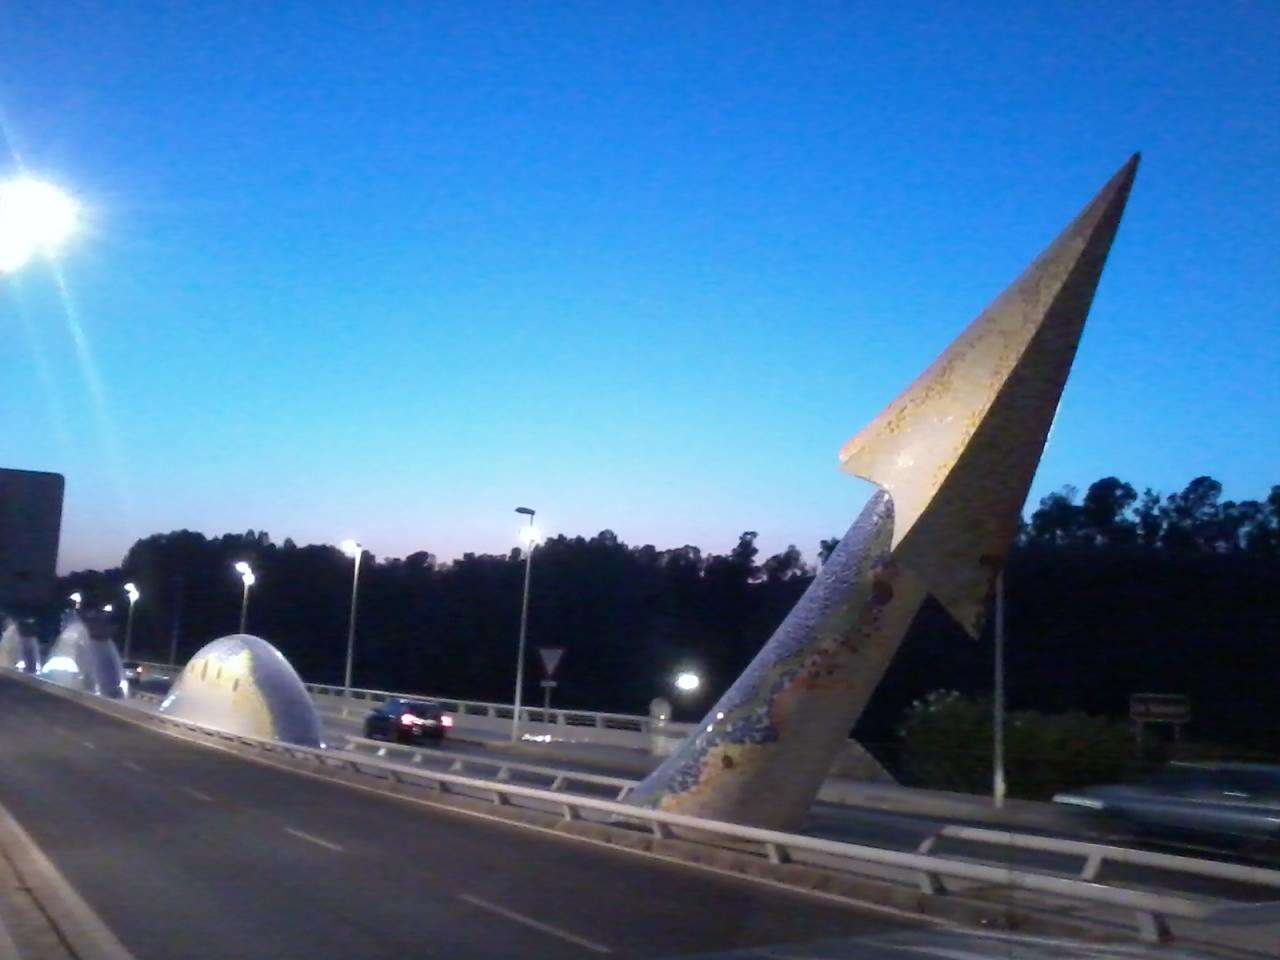 puente del dragon alcala de guadaira